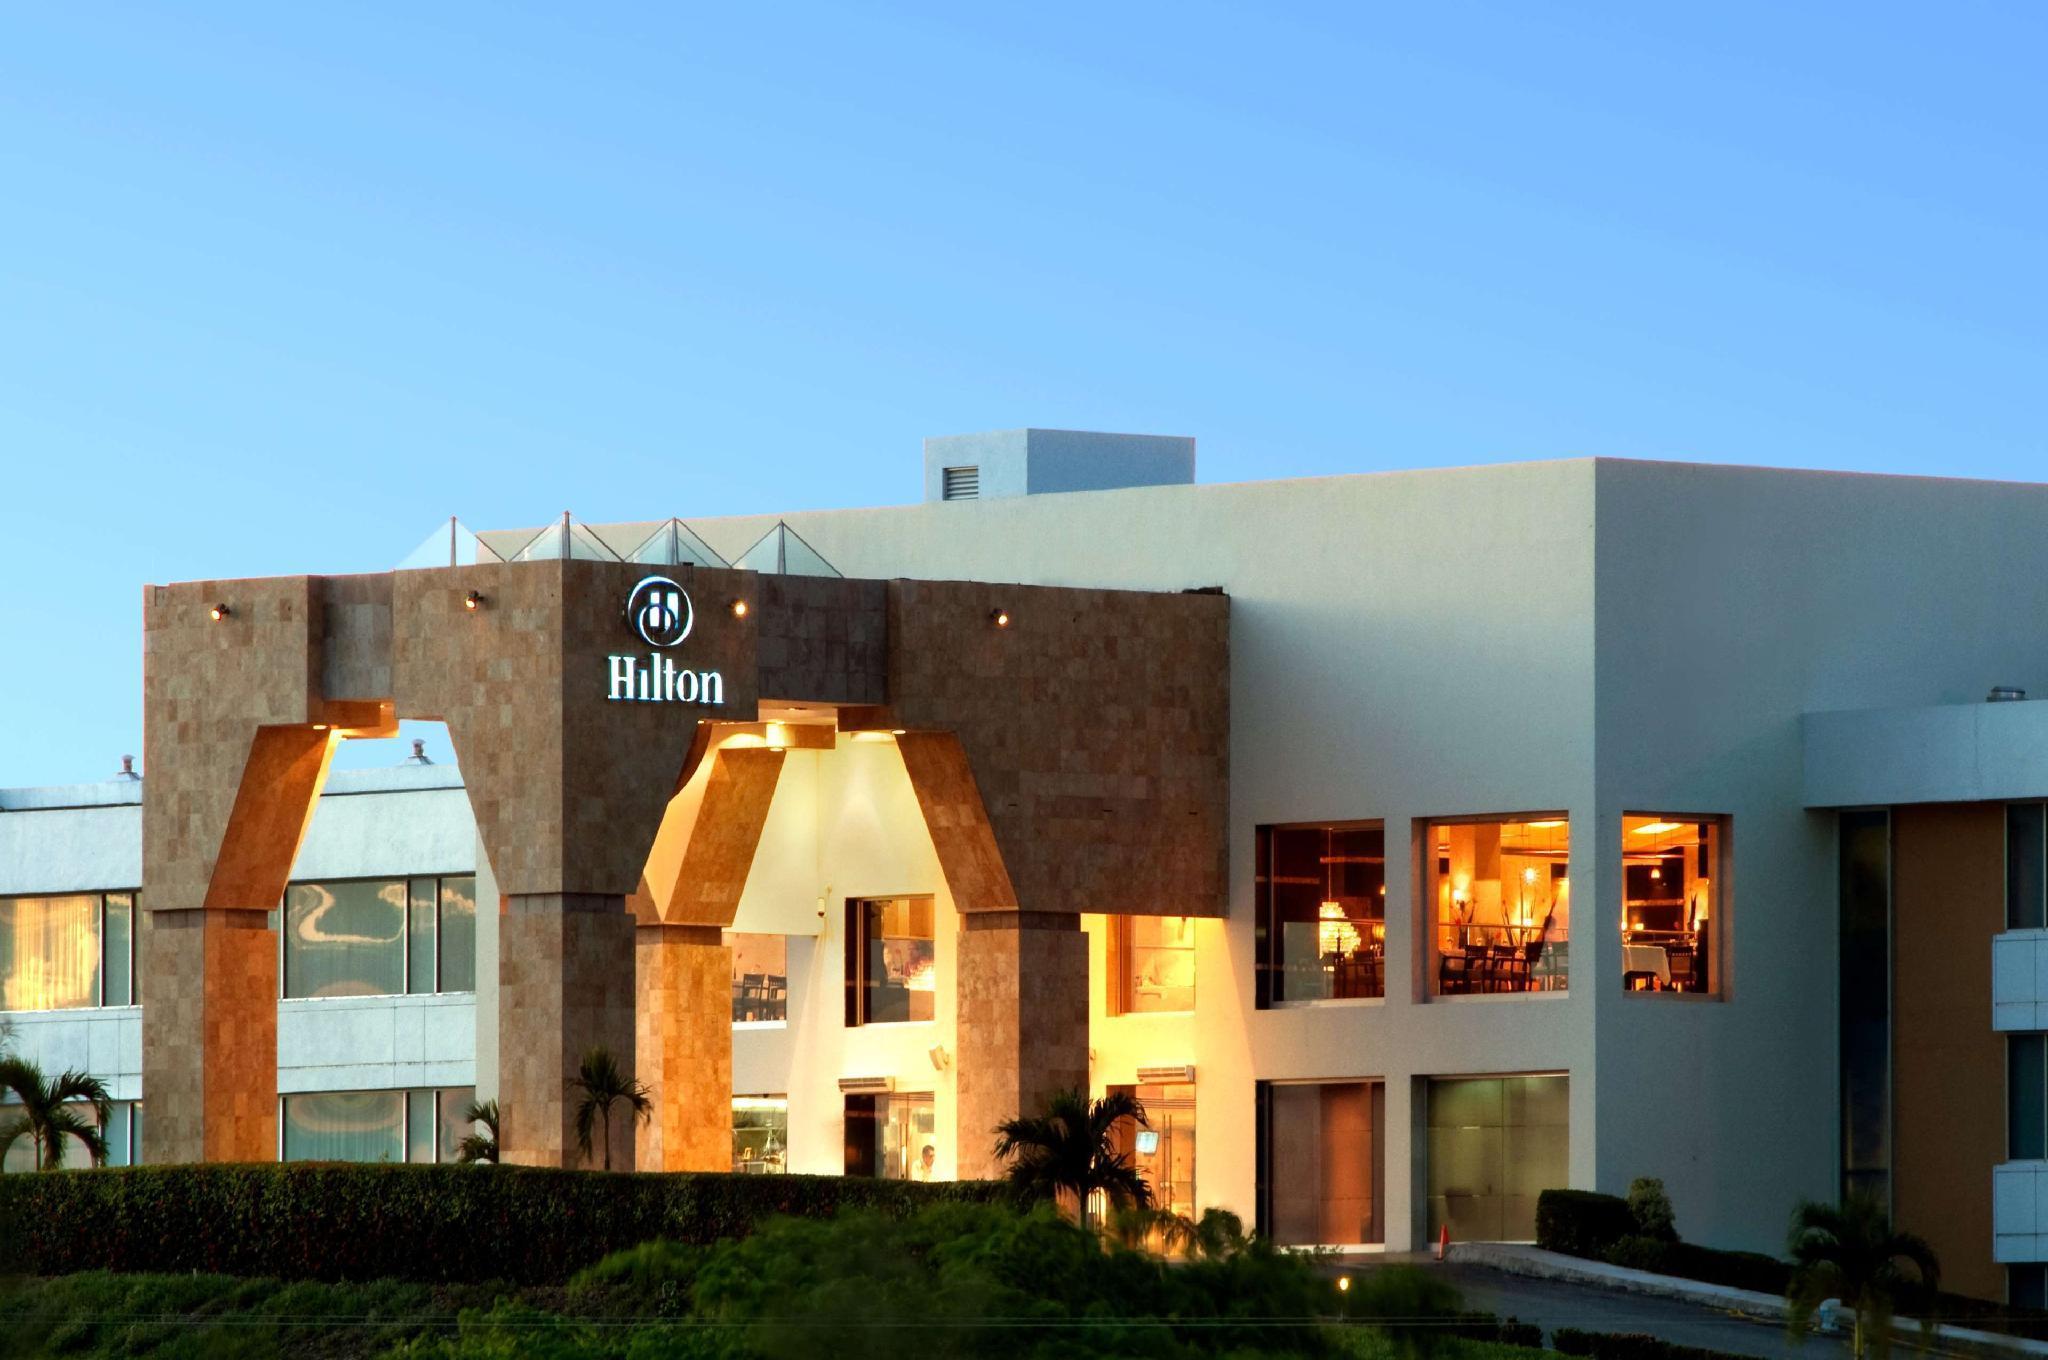 Hilton Villahermosa And Conference Center Hotel